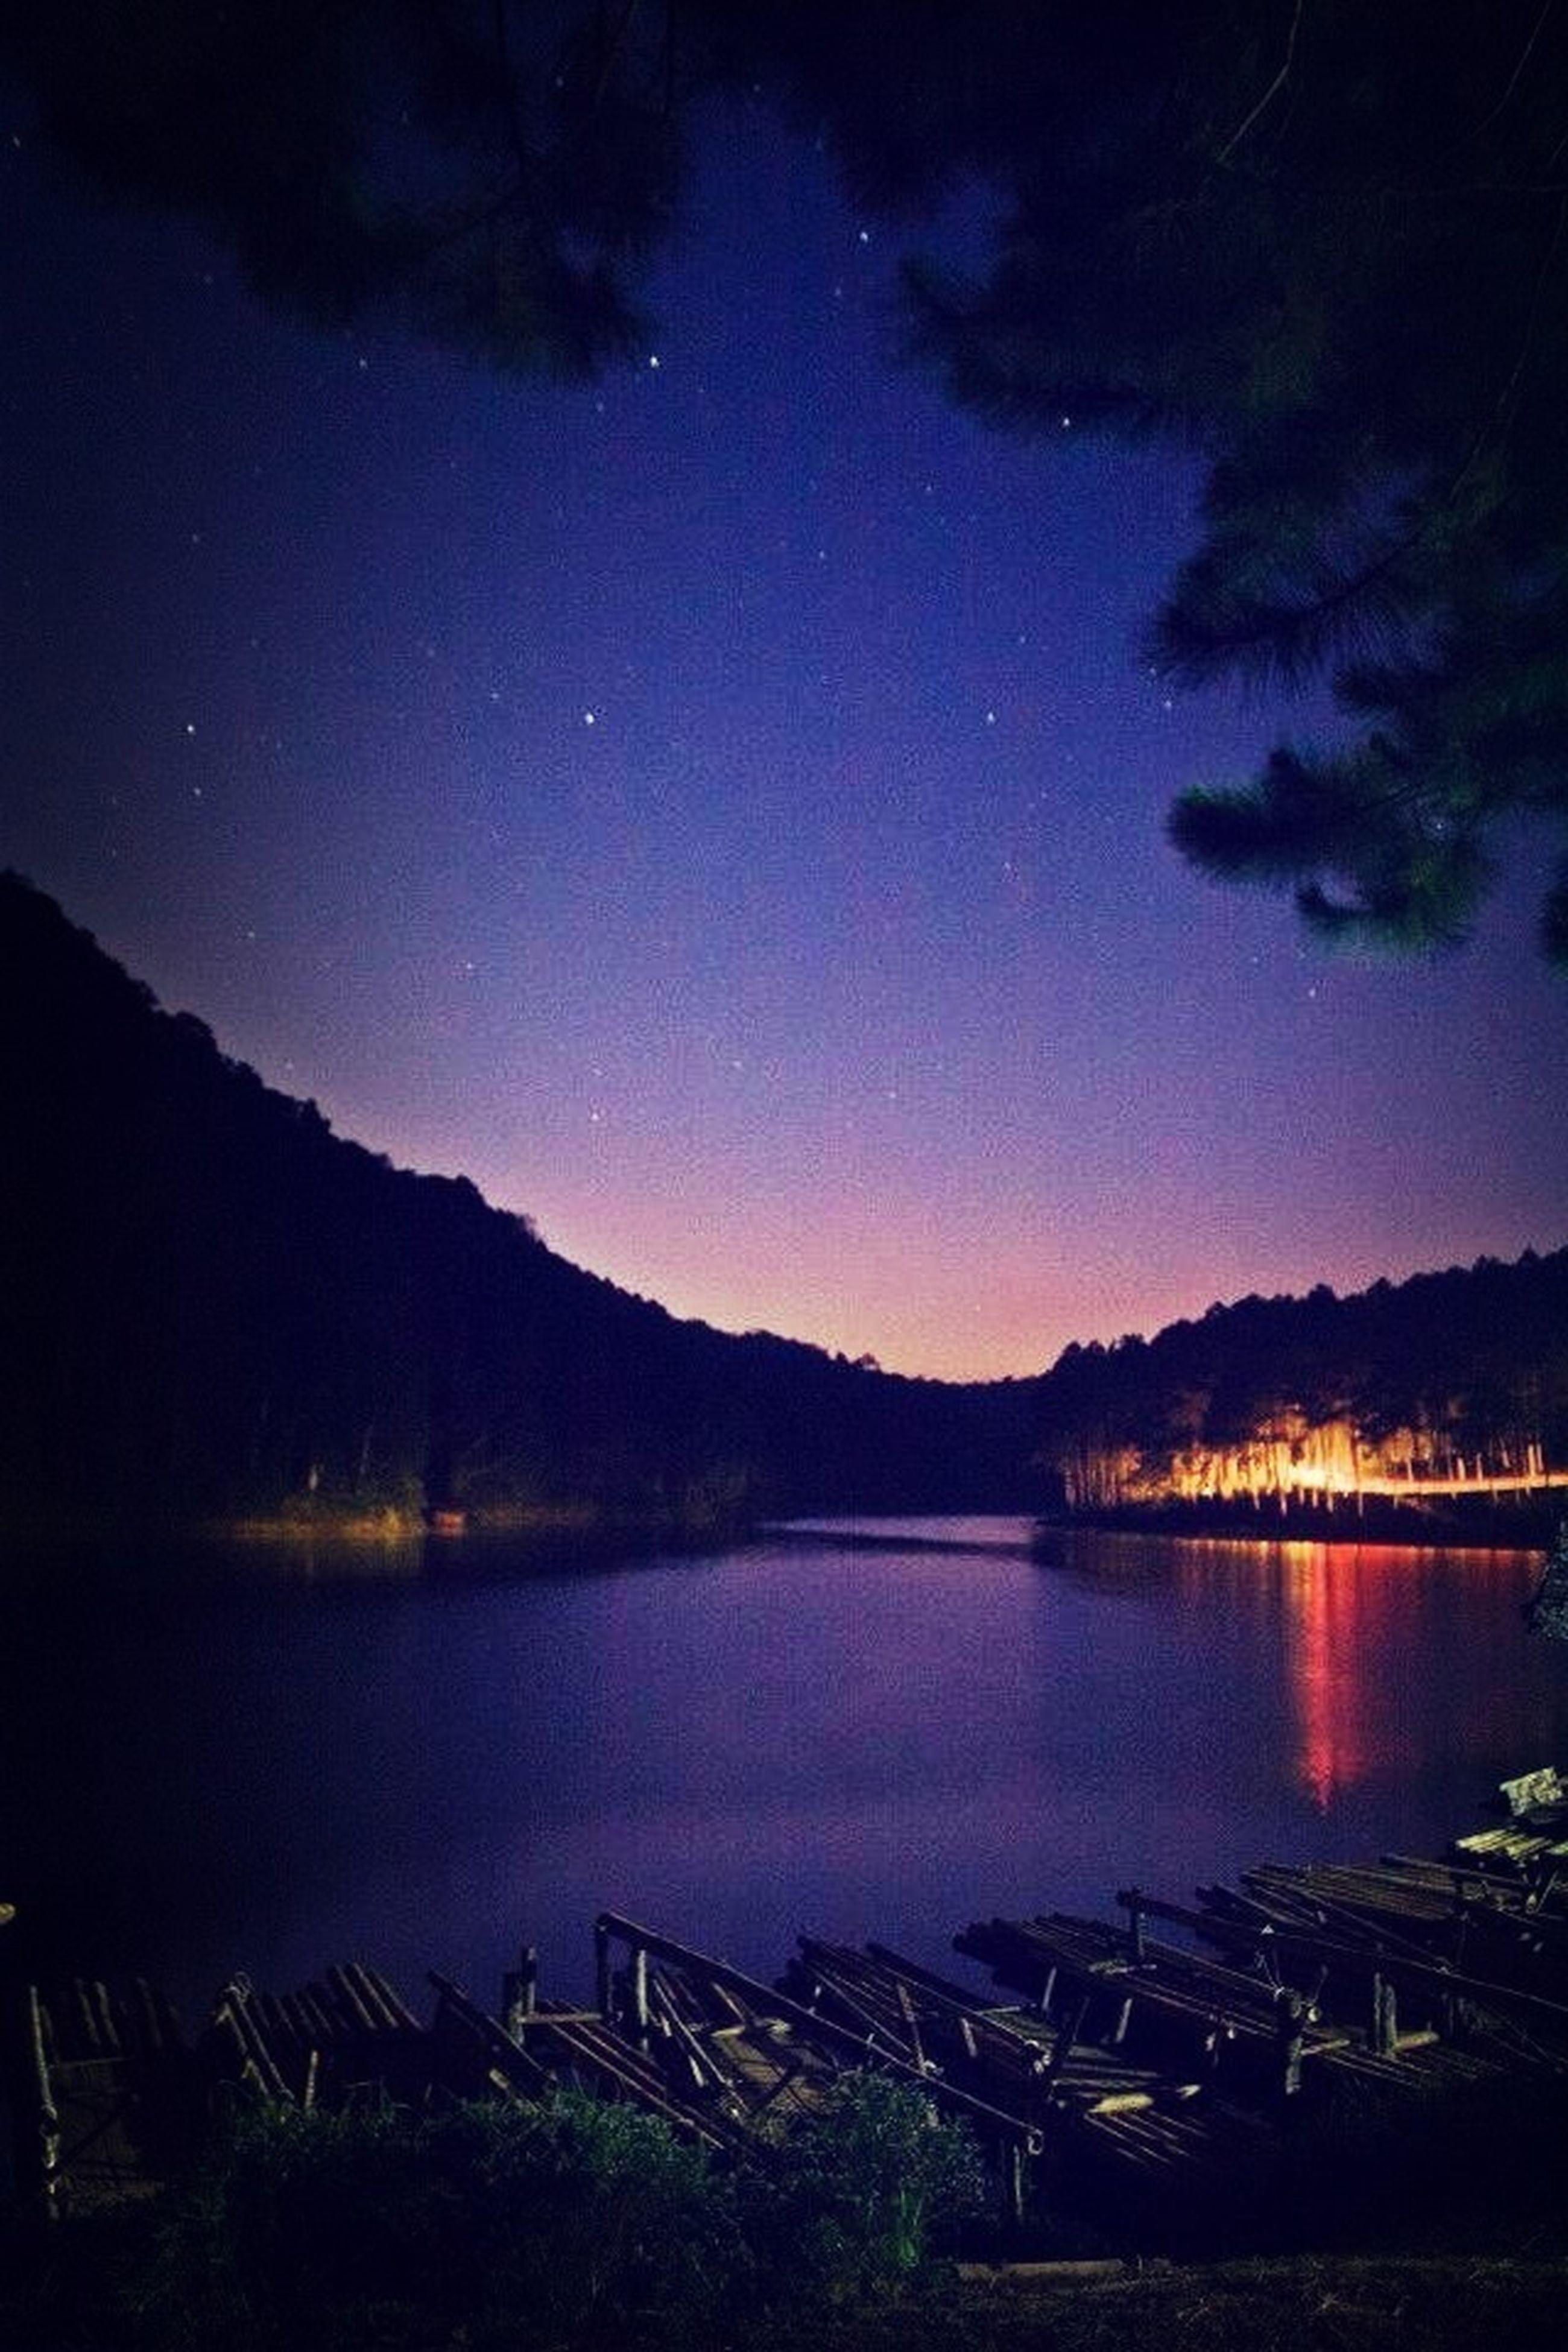 night, water, tranquil scene, scenics, tranquility, lake, beauty in nature, illuminated, mountain, reflection, sky, nature, idyllic, silhouette, tree, blue, mountain range, river, calm, dusk